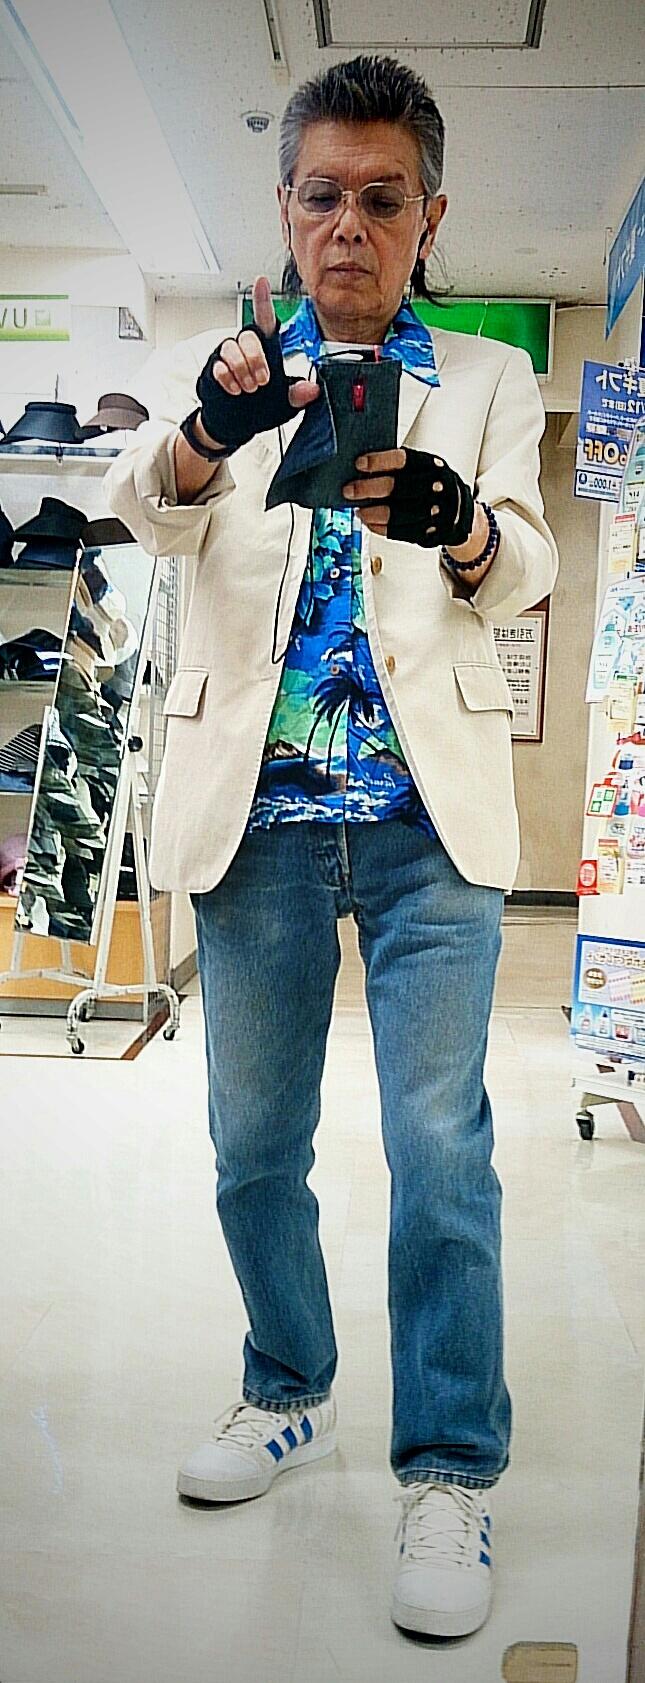 KEN'NNY_20150605